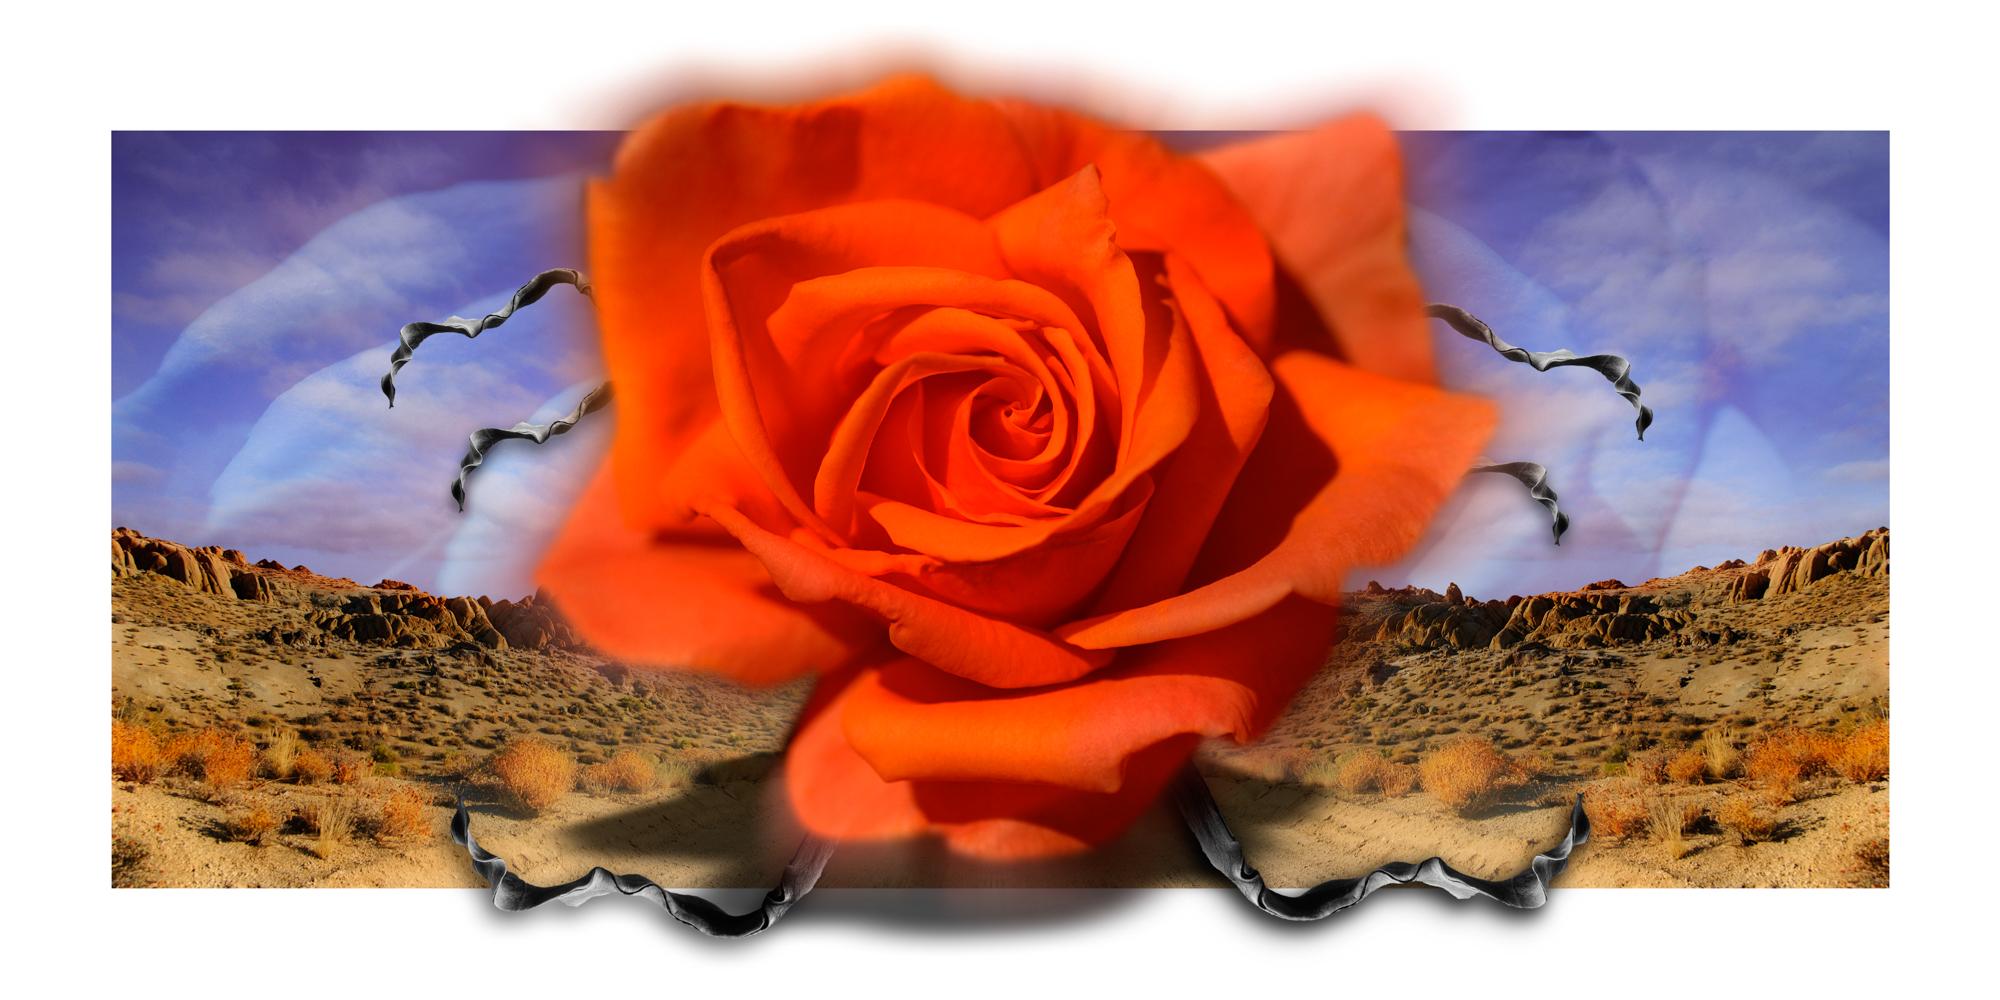 Alabama Hills Rose